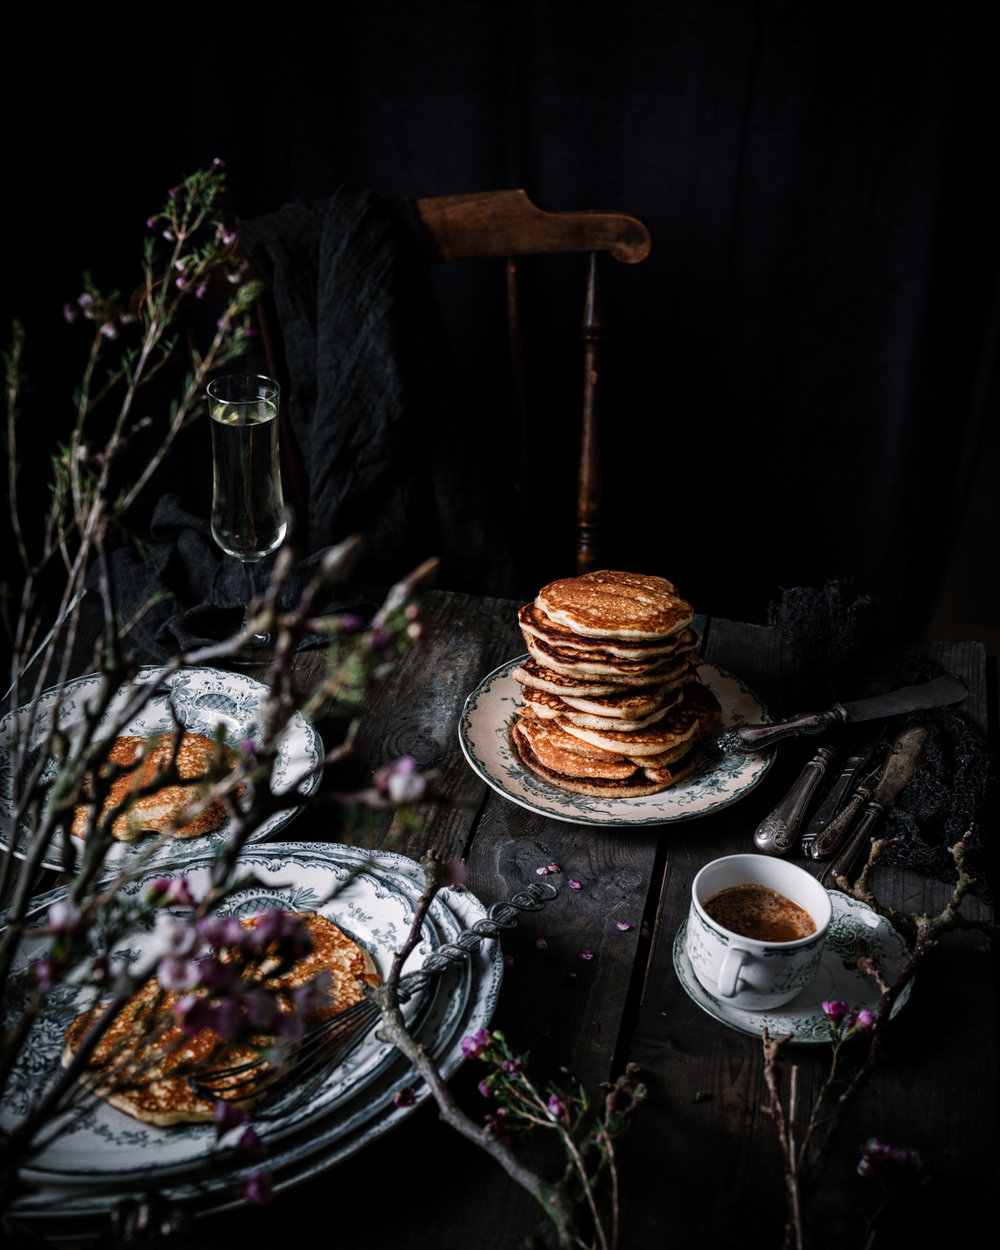 mats dreyer pannekaker pancakes fotograf photography food stylist-1